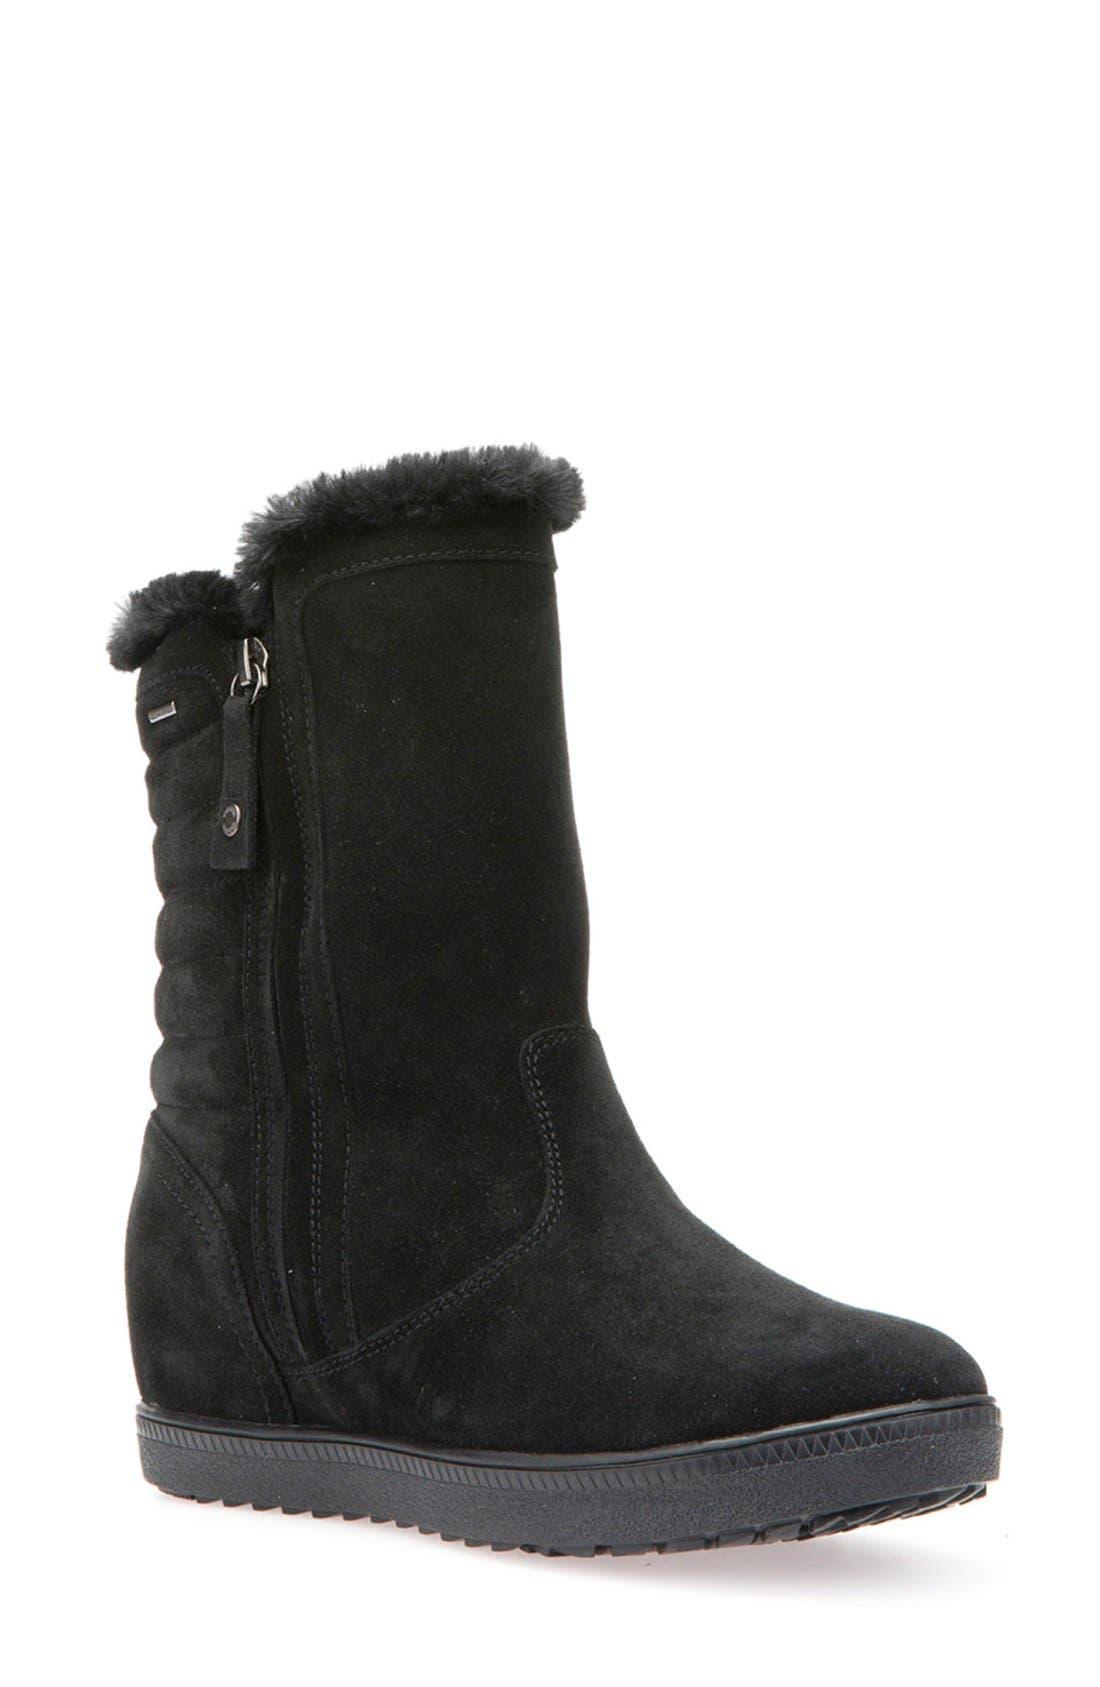 GEOX 'Amaranth' Waterproof Boot, Main, color, 001